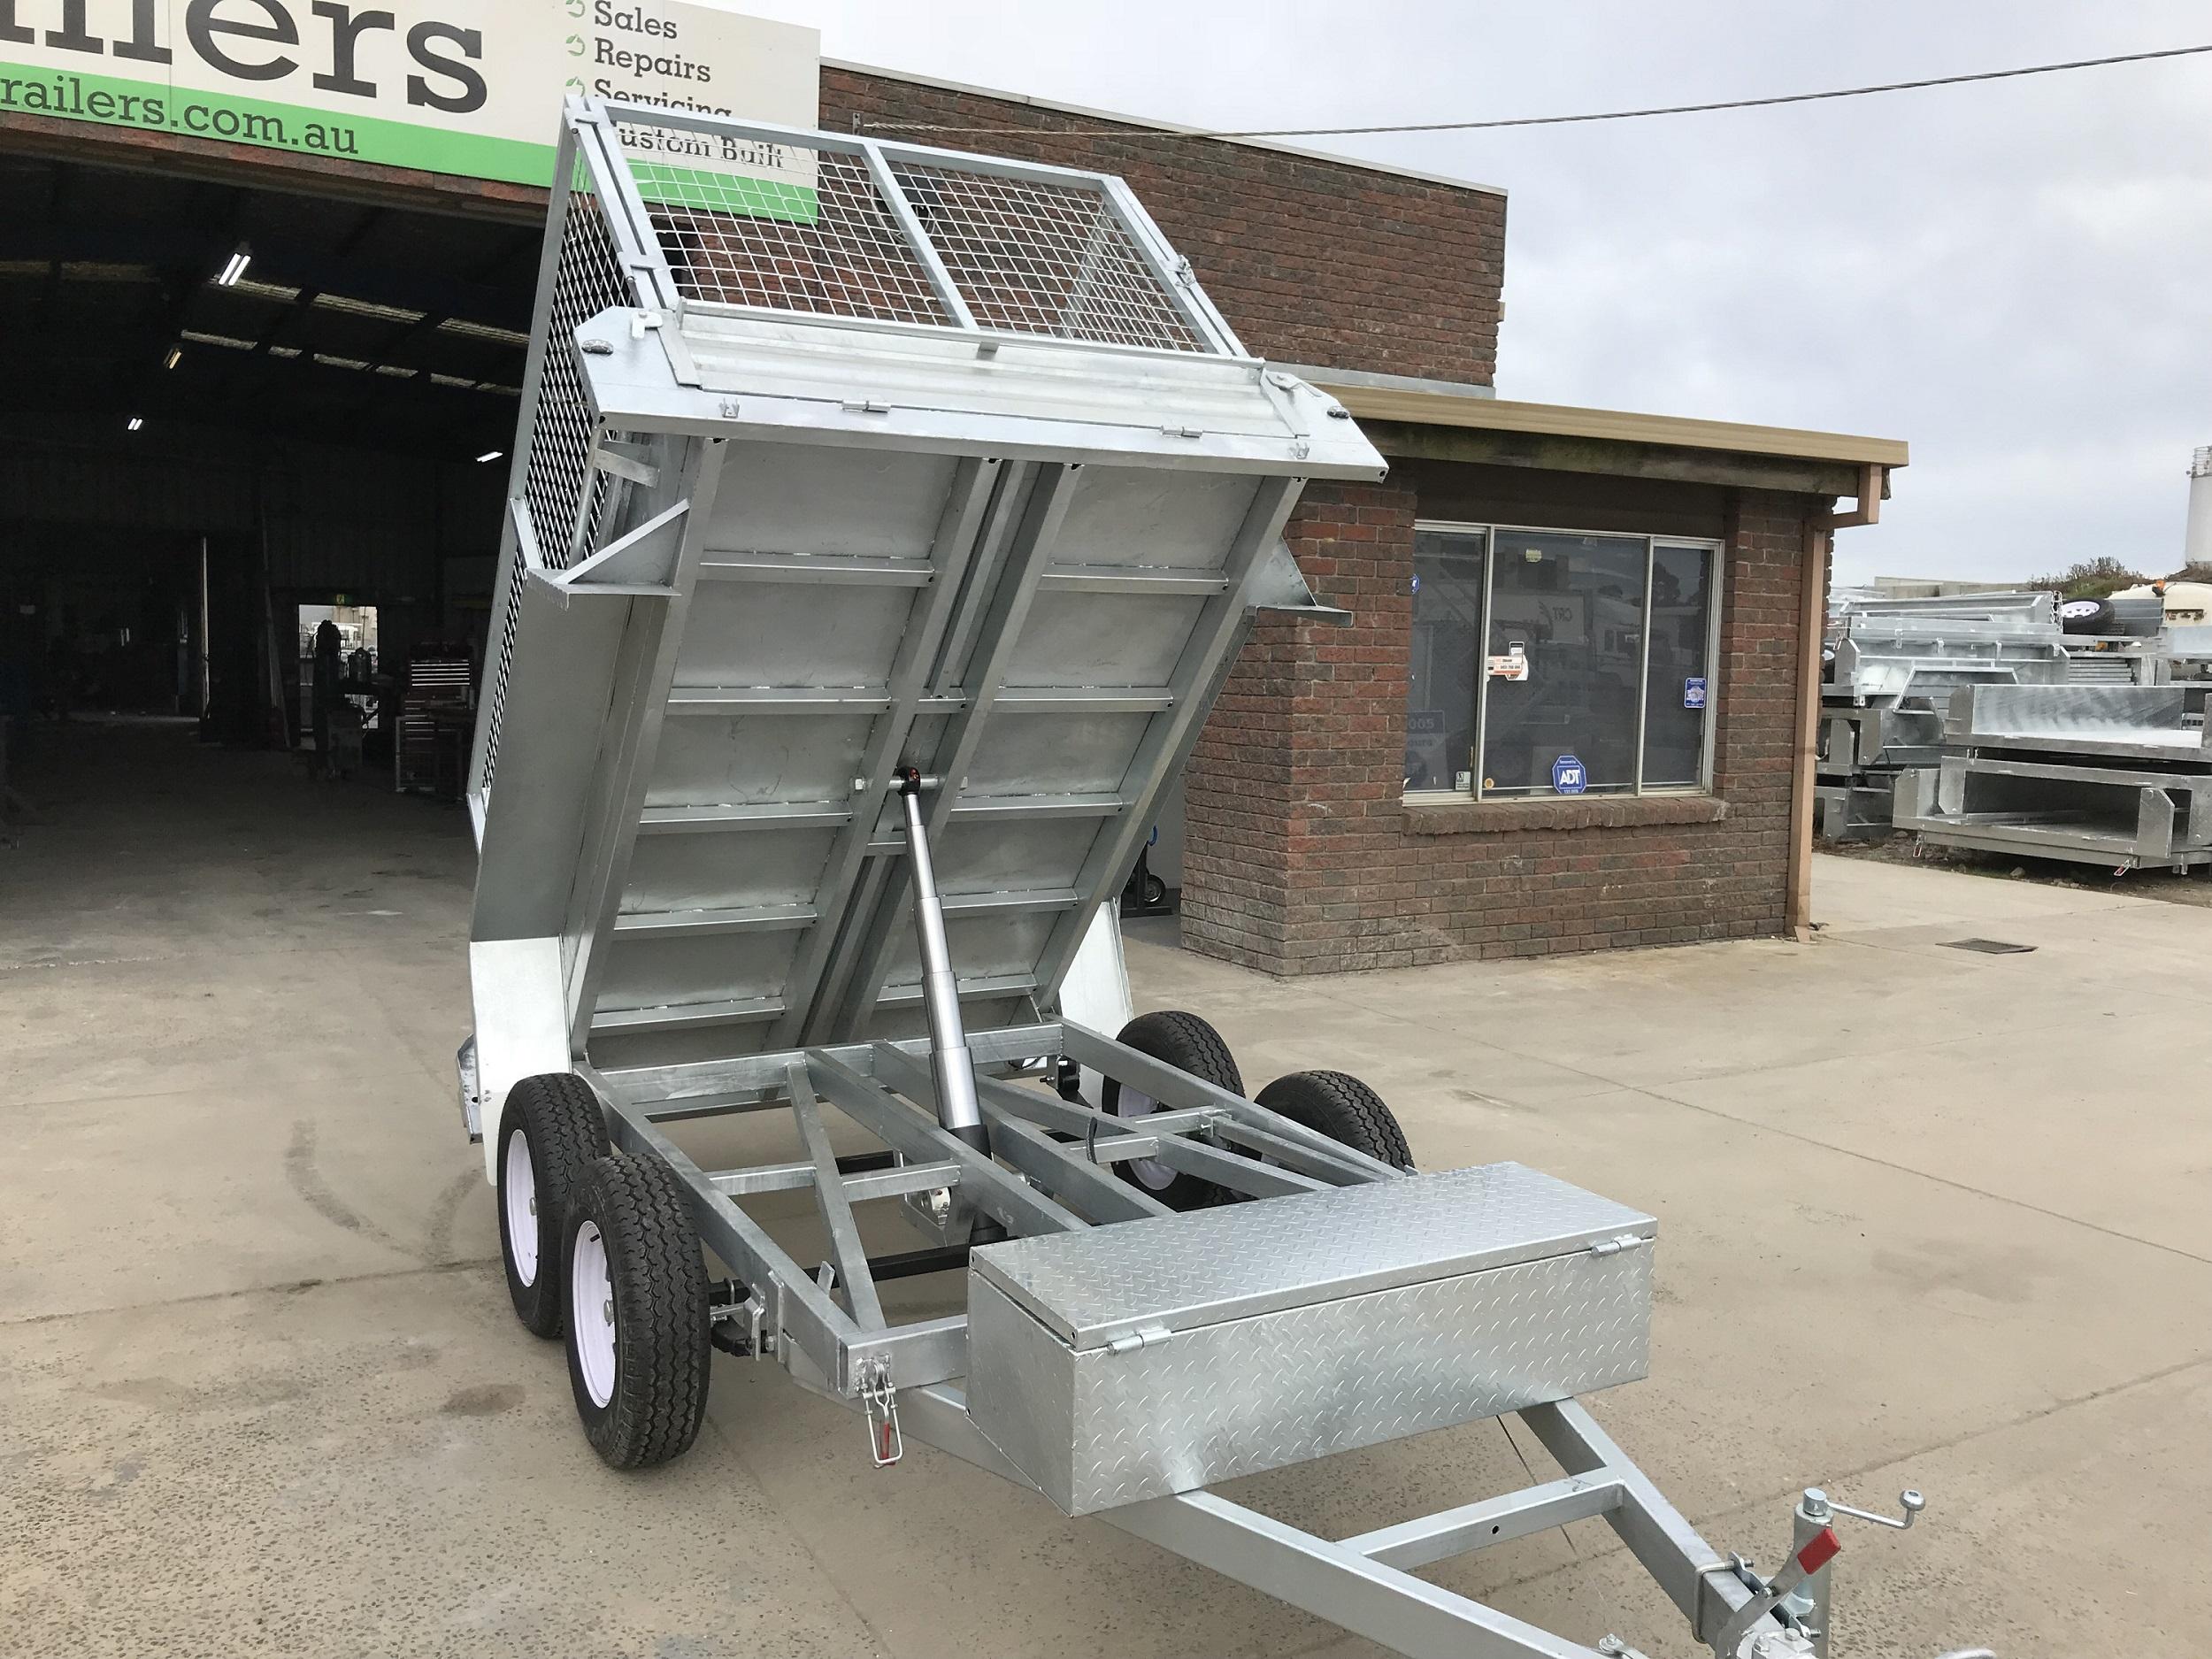 8x5 Hydraulic tandem tipper trailer Galvanised